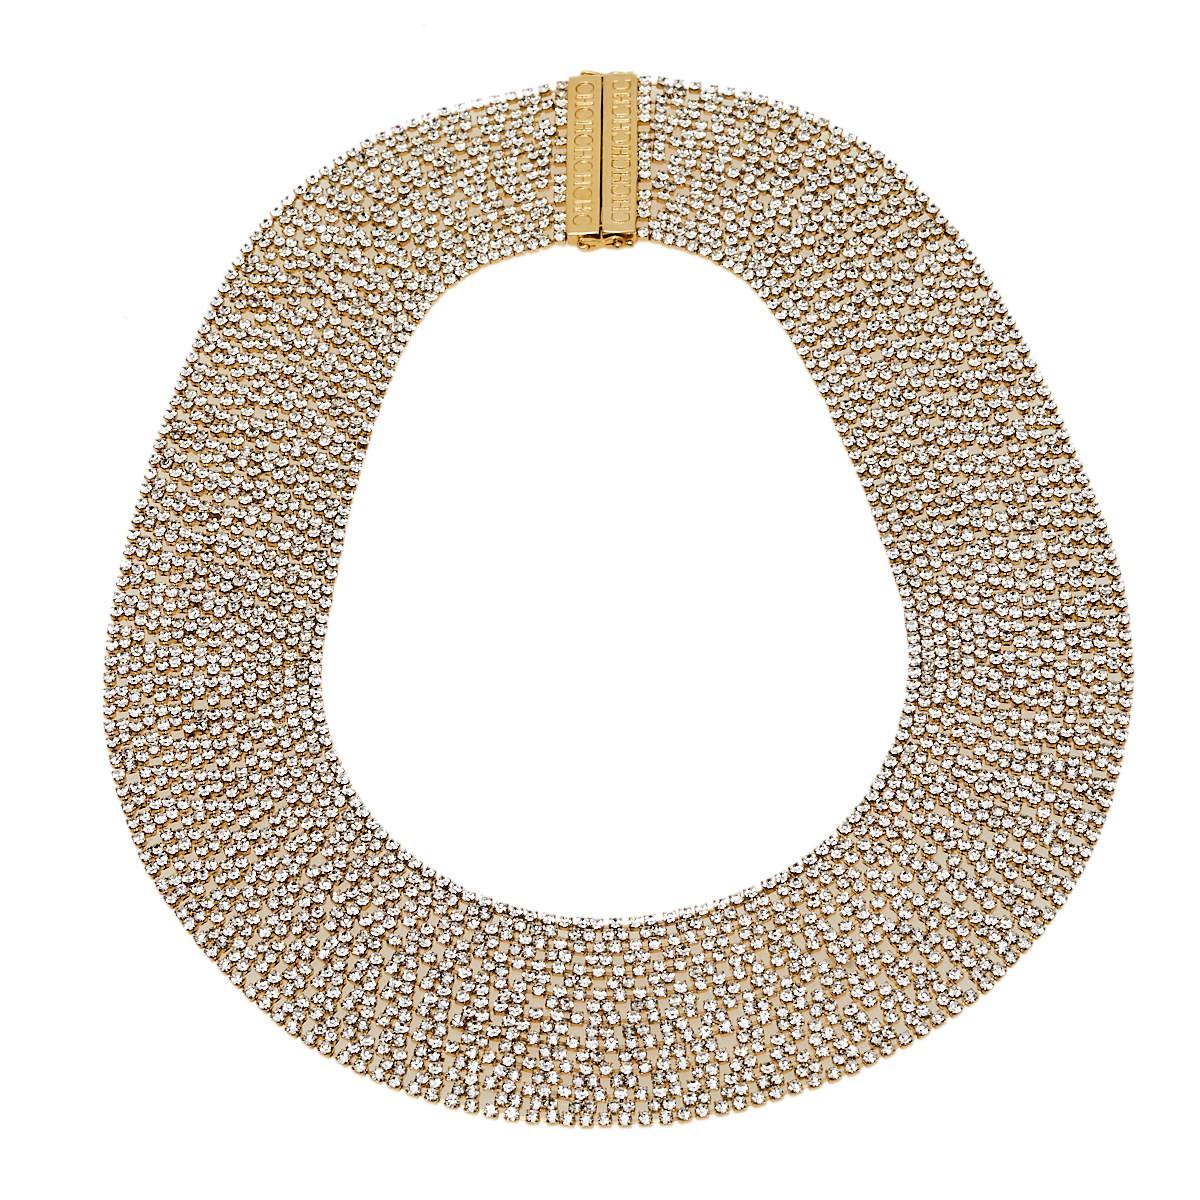 Carolina Herrera Gold Tone Crystal Mesh Band Necklace